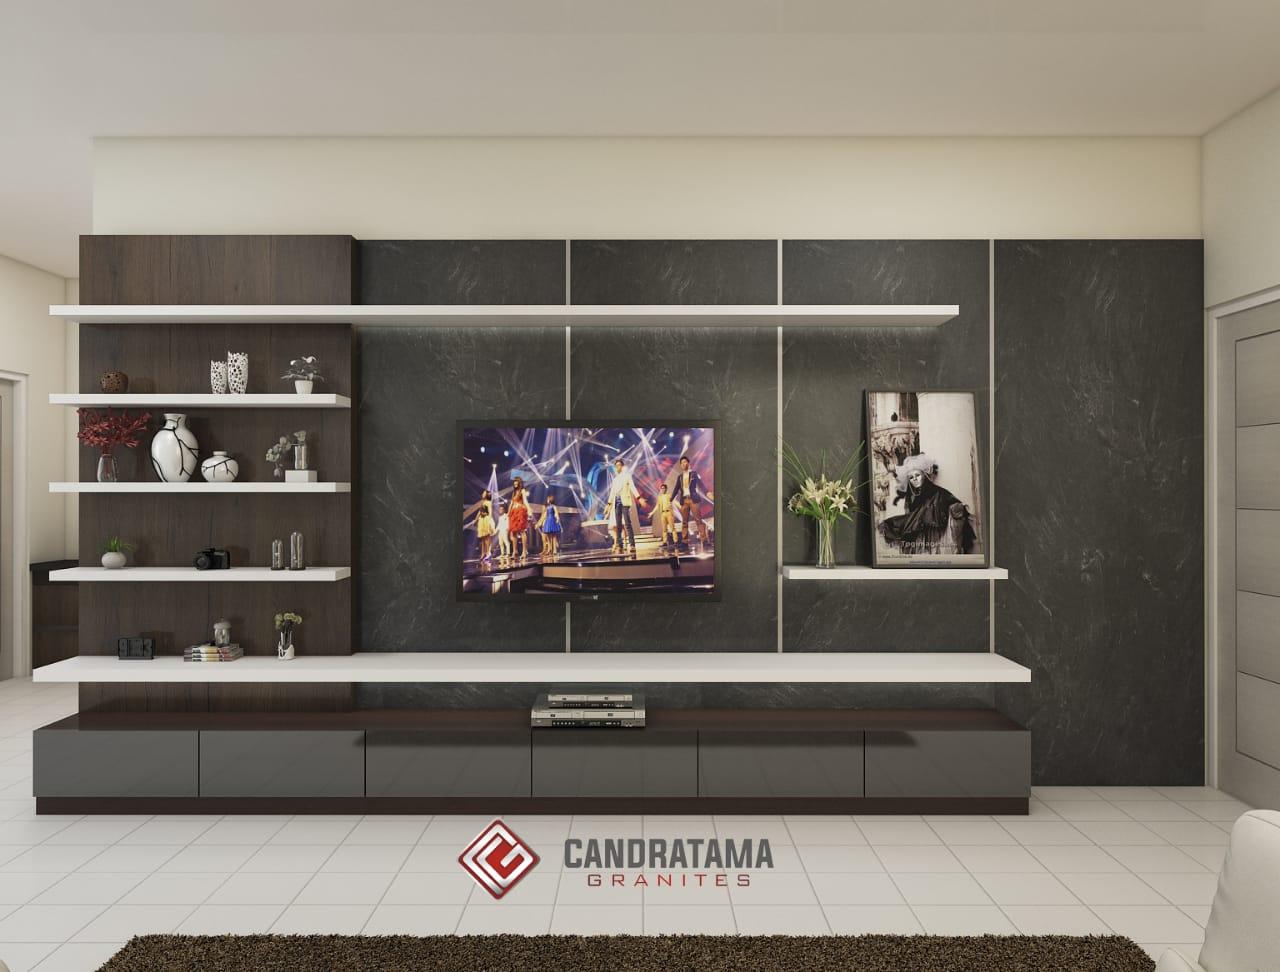 desain backdrop tv terbaru